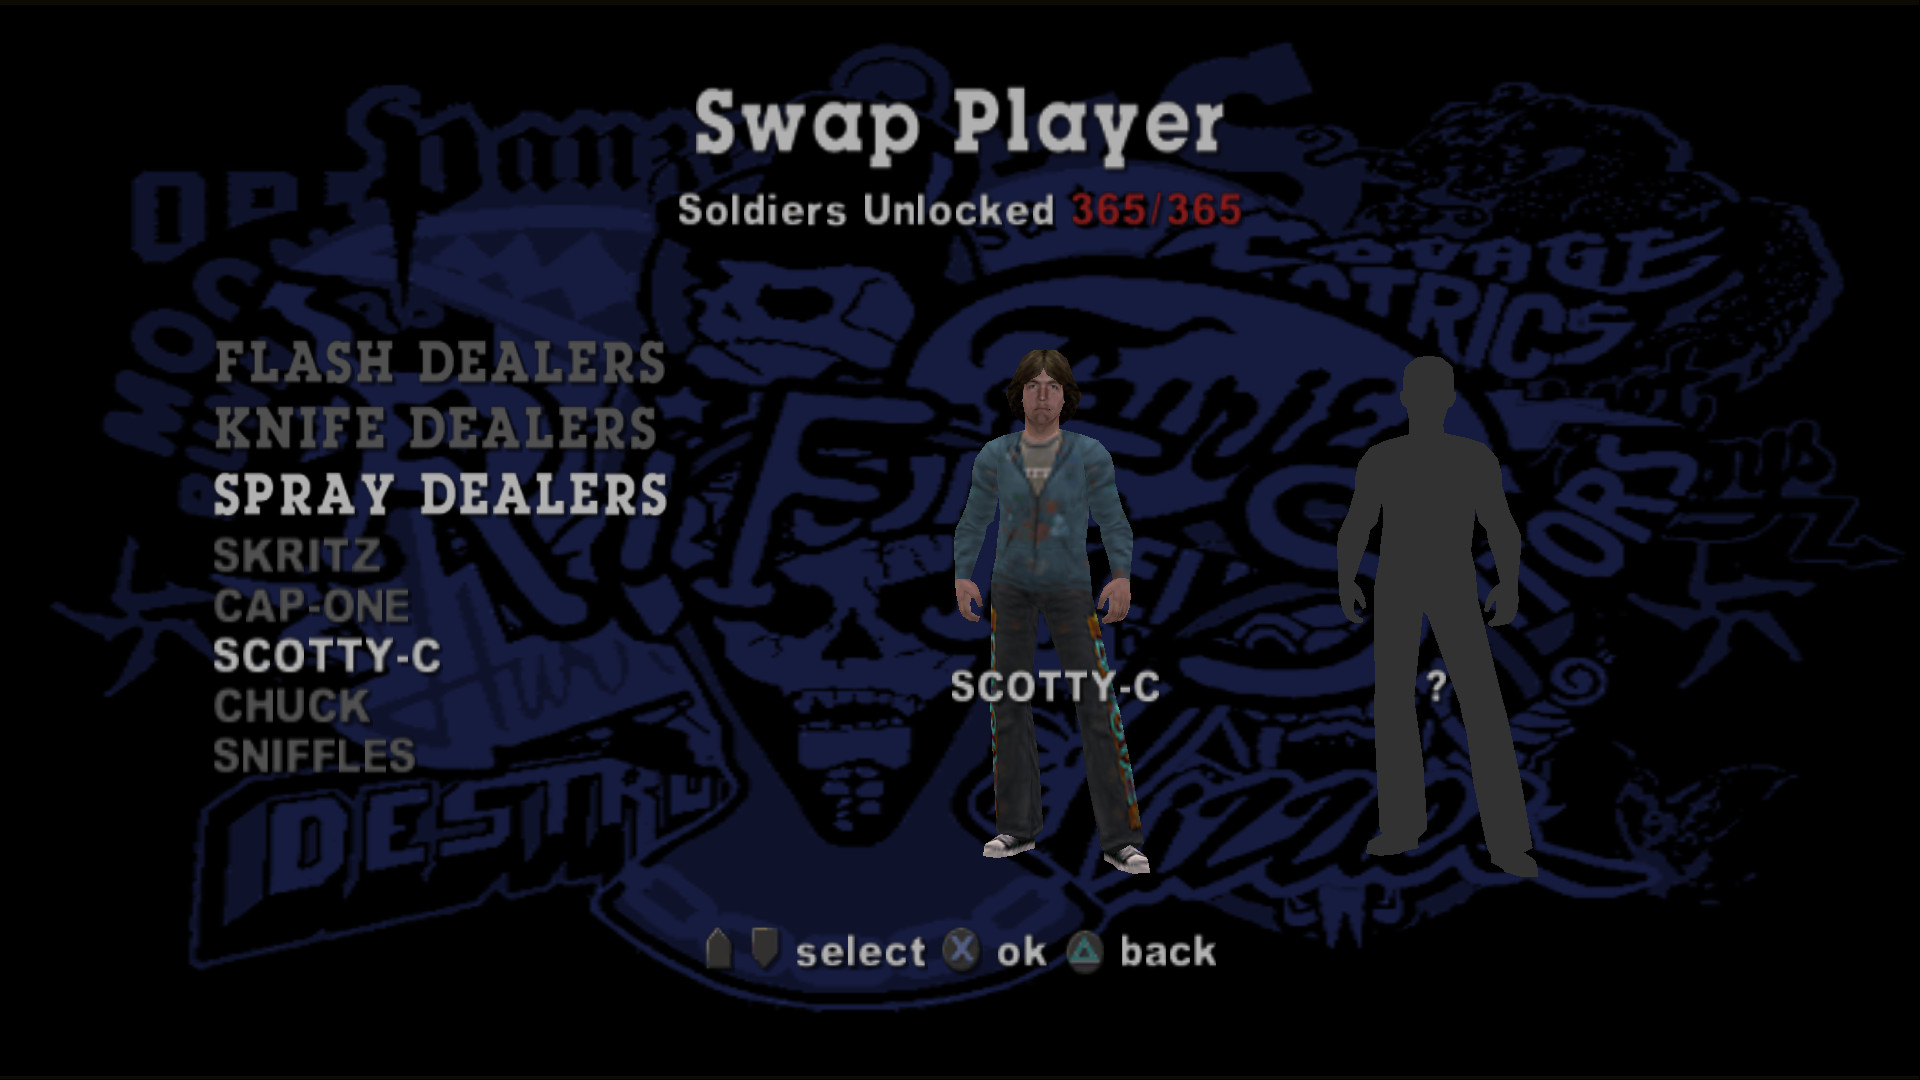 Category:Spray Dealers | The Warriors | FANDOM powered by Wikia